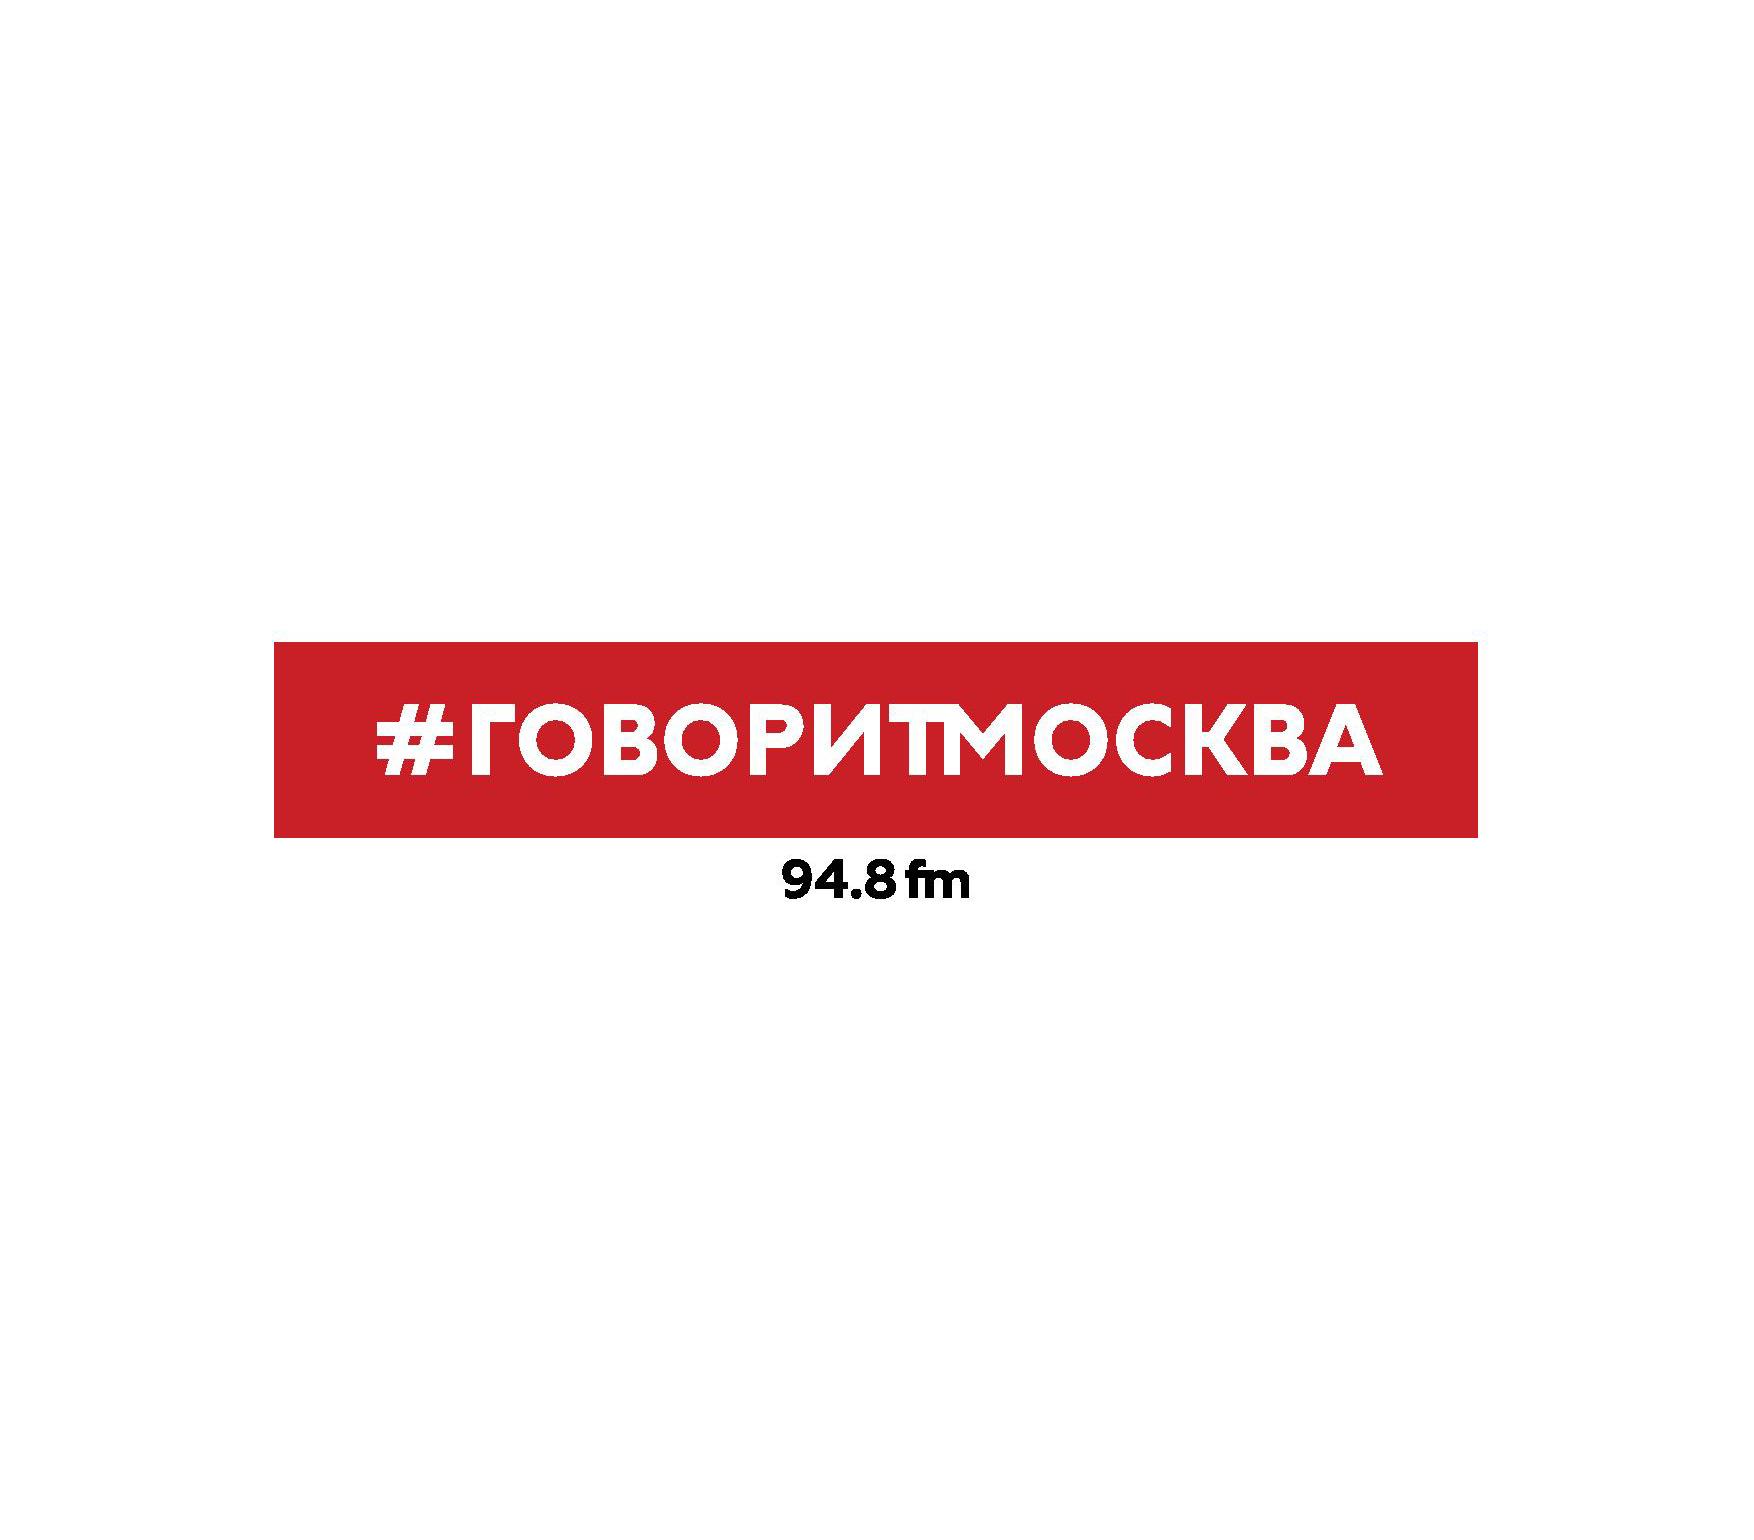 Макс Челноков 17 апреля. Андрей Кураев макс челноков 14 апреля андрей орлов